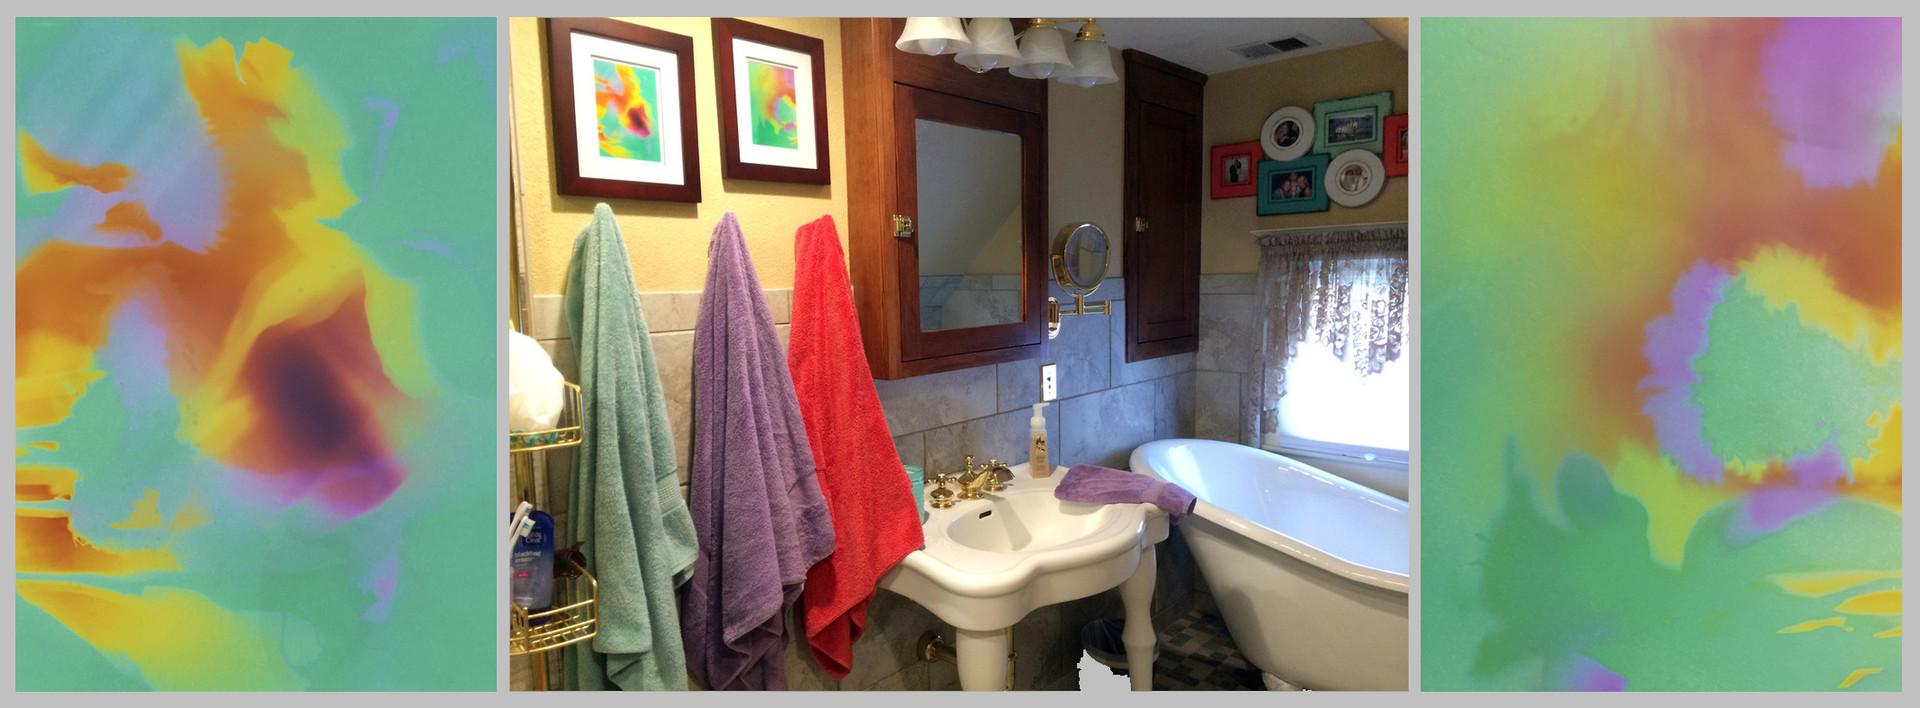 "7"" x 5"" each, Bathroom, Turlock, CA"